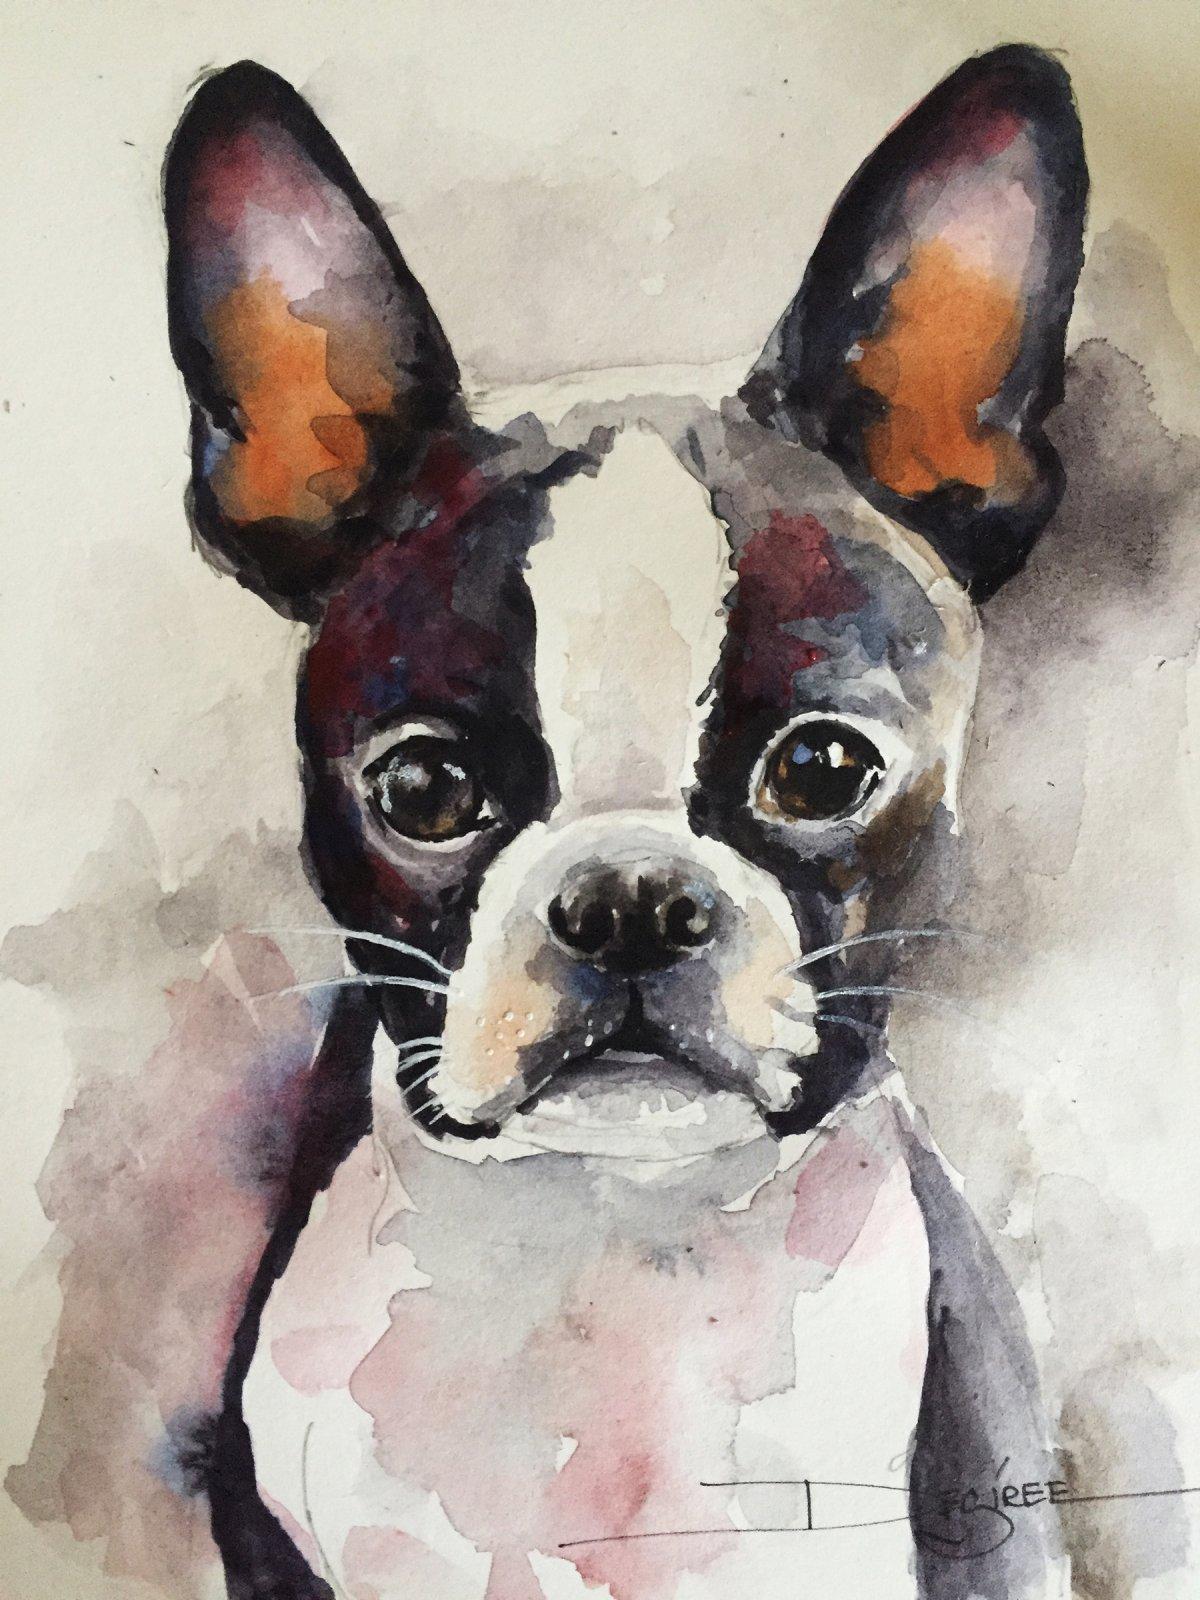 Boston Terrier Art Print 8x 10 (AW-01)